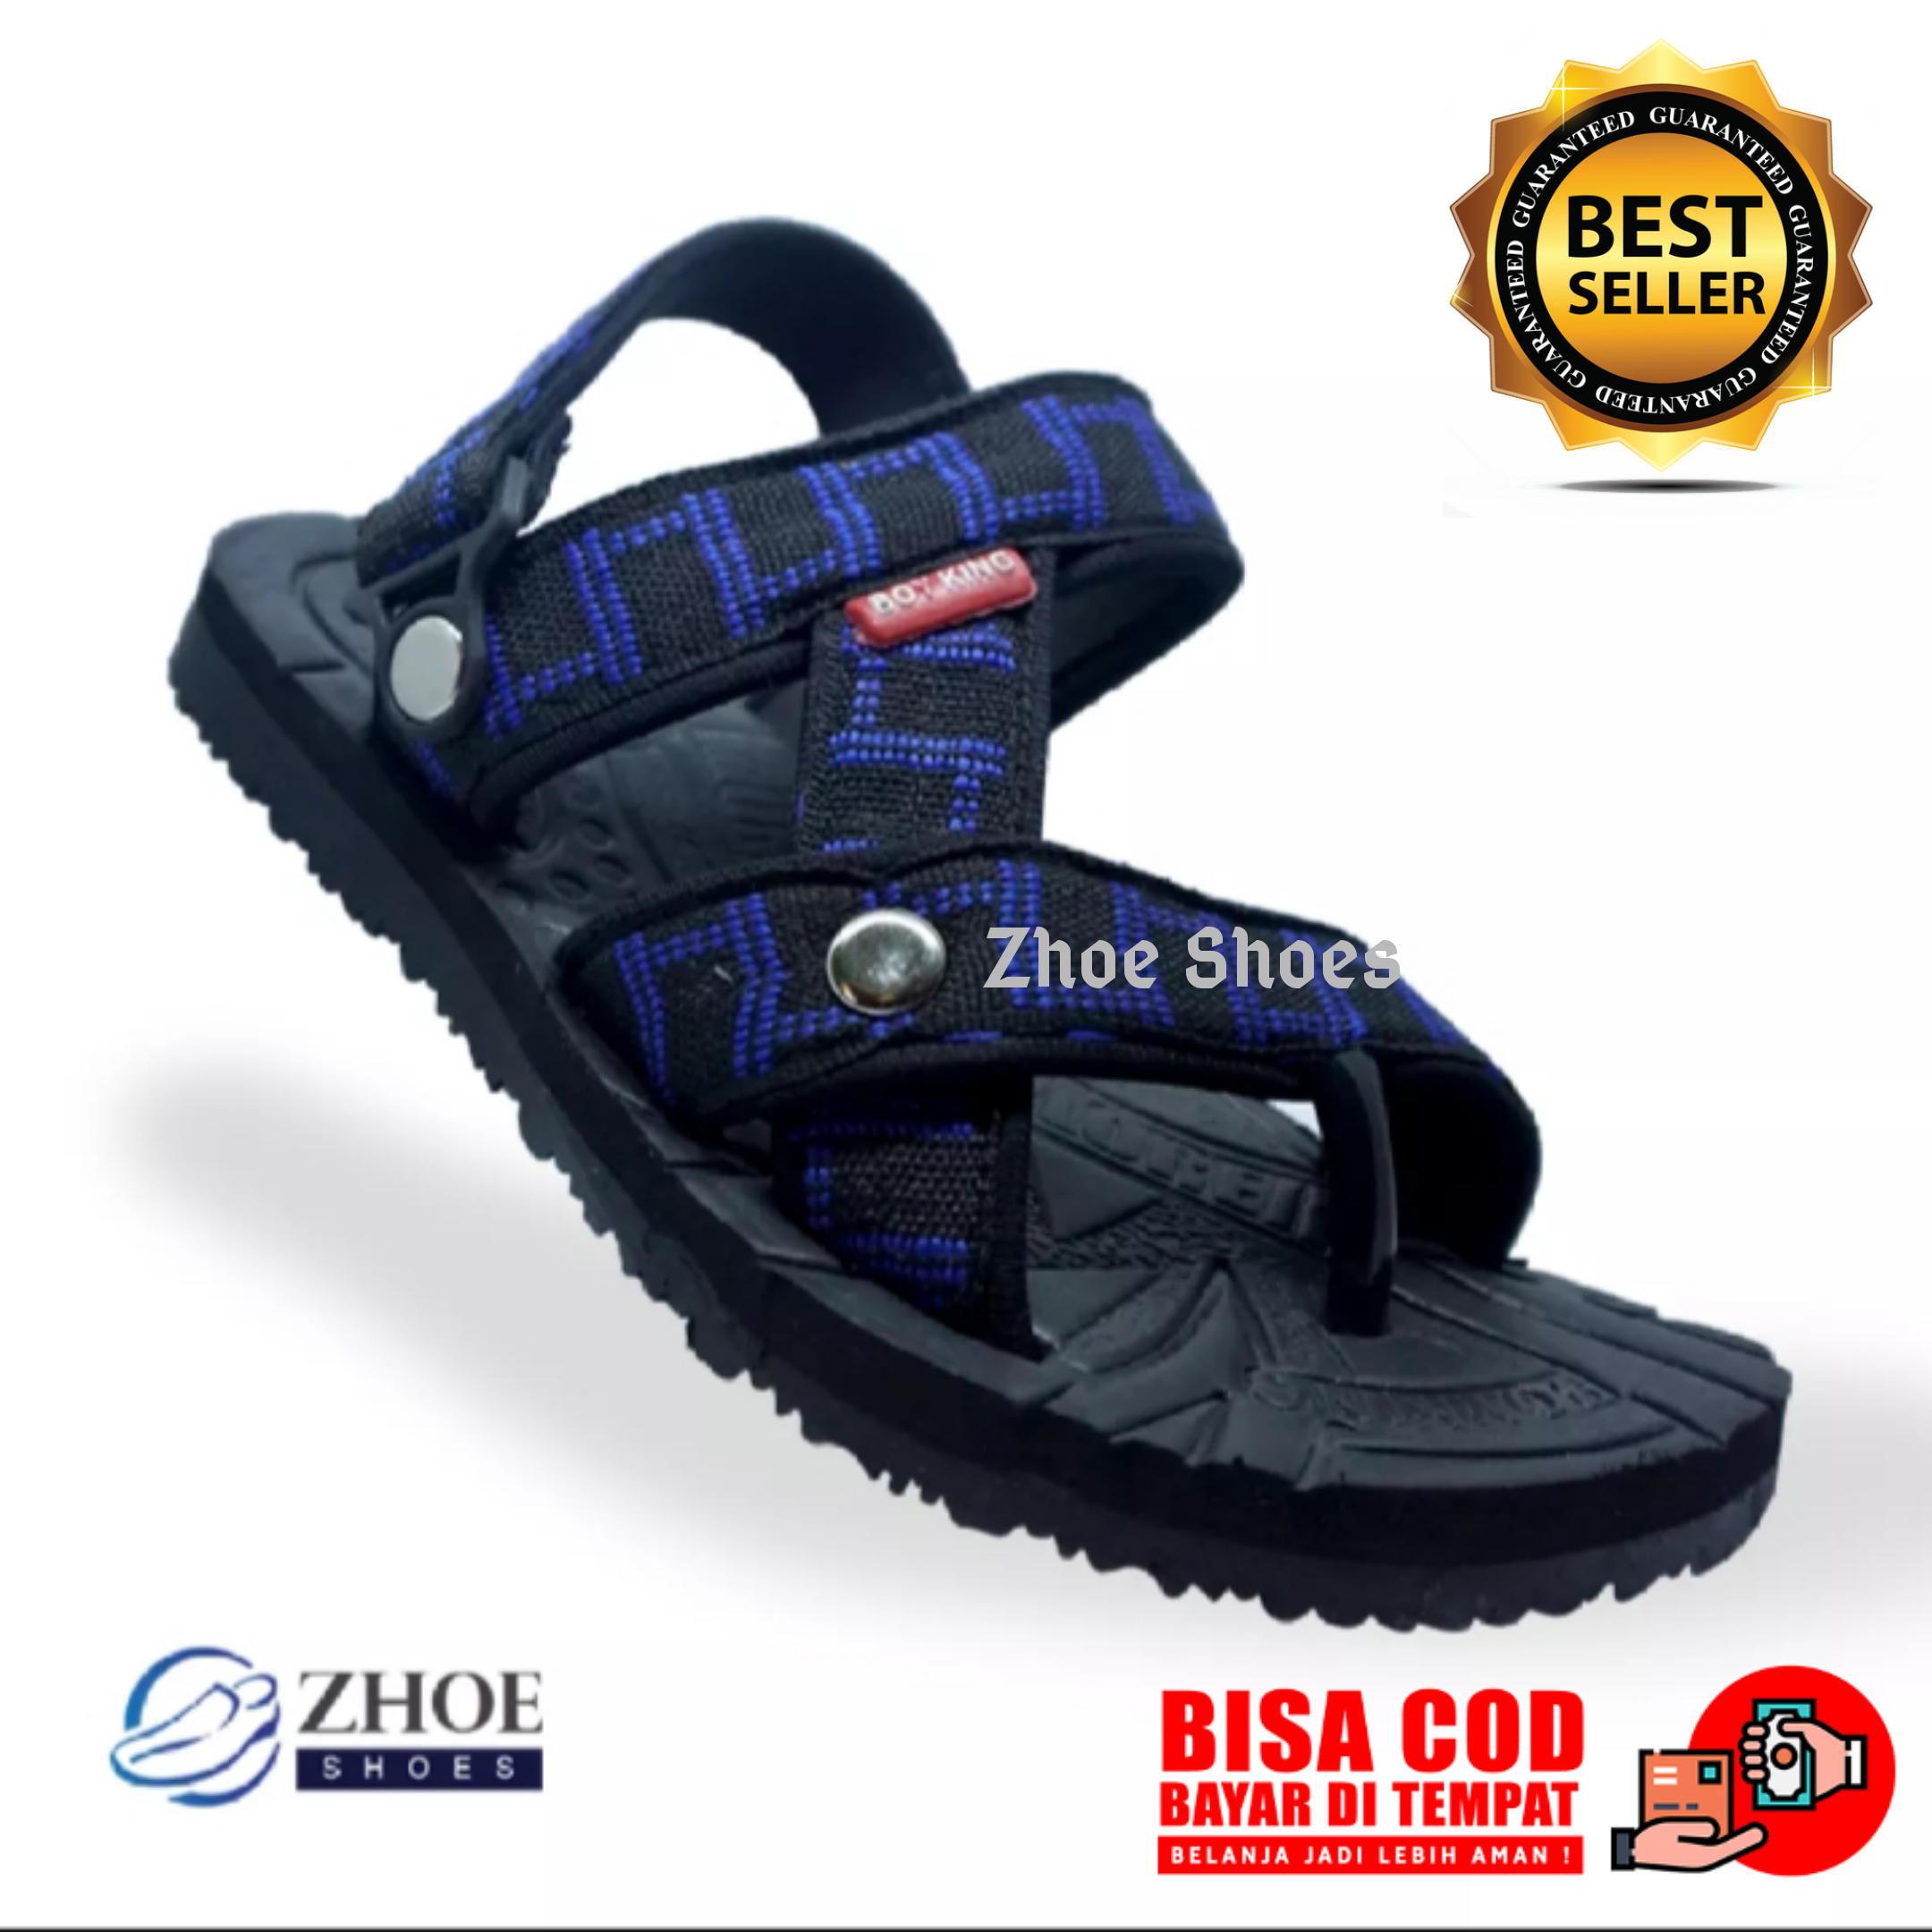 Zhoe Shoes - Sandal Gunung Pria anak dan dewasa / Sandal Gunung Terbaru anak / Sandal Gunung Murah dewasa/ Sandal Gunung Selop / Sandal selop / Sandal selop pria / Sandal Pria / Sandal Murah